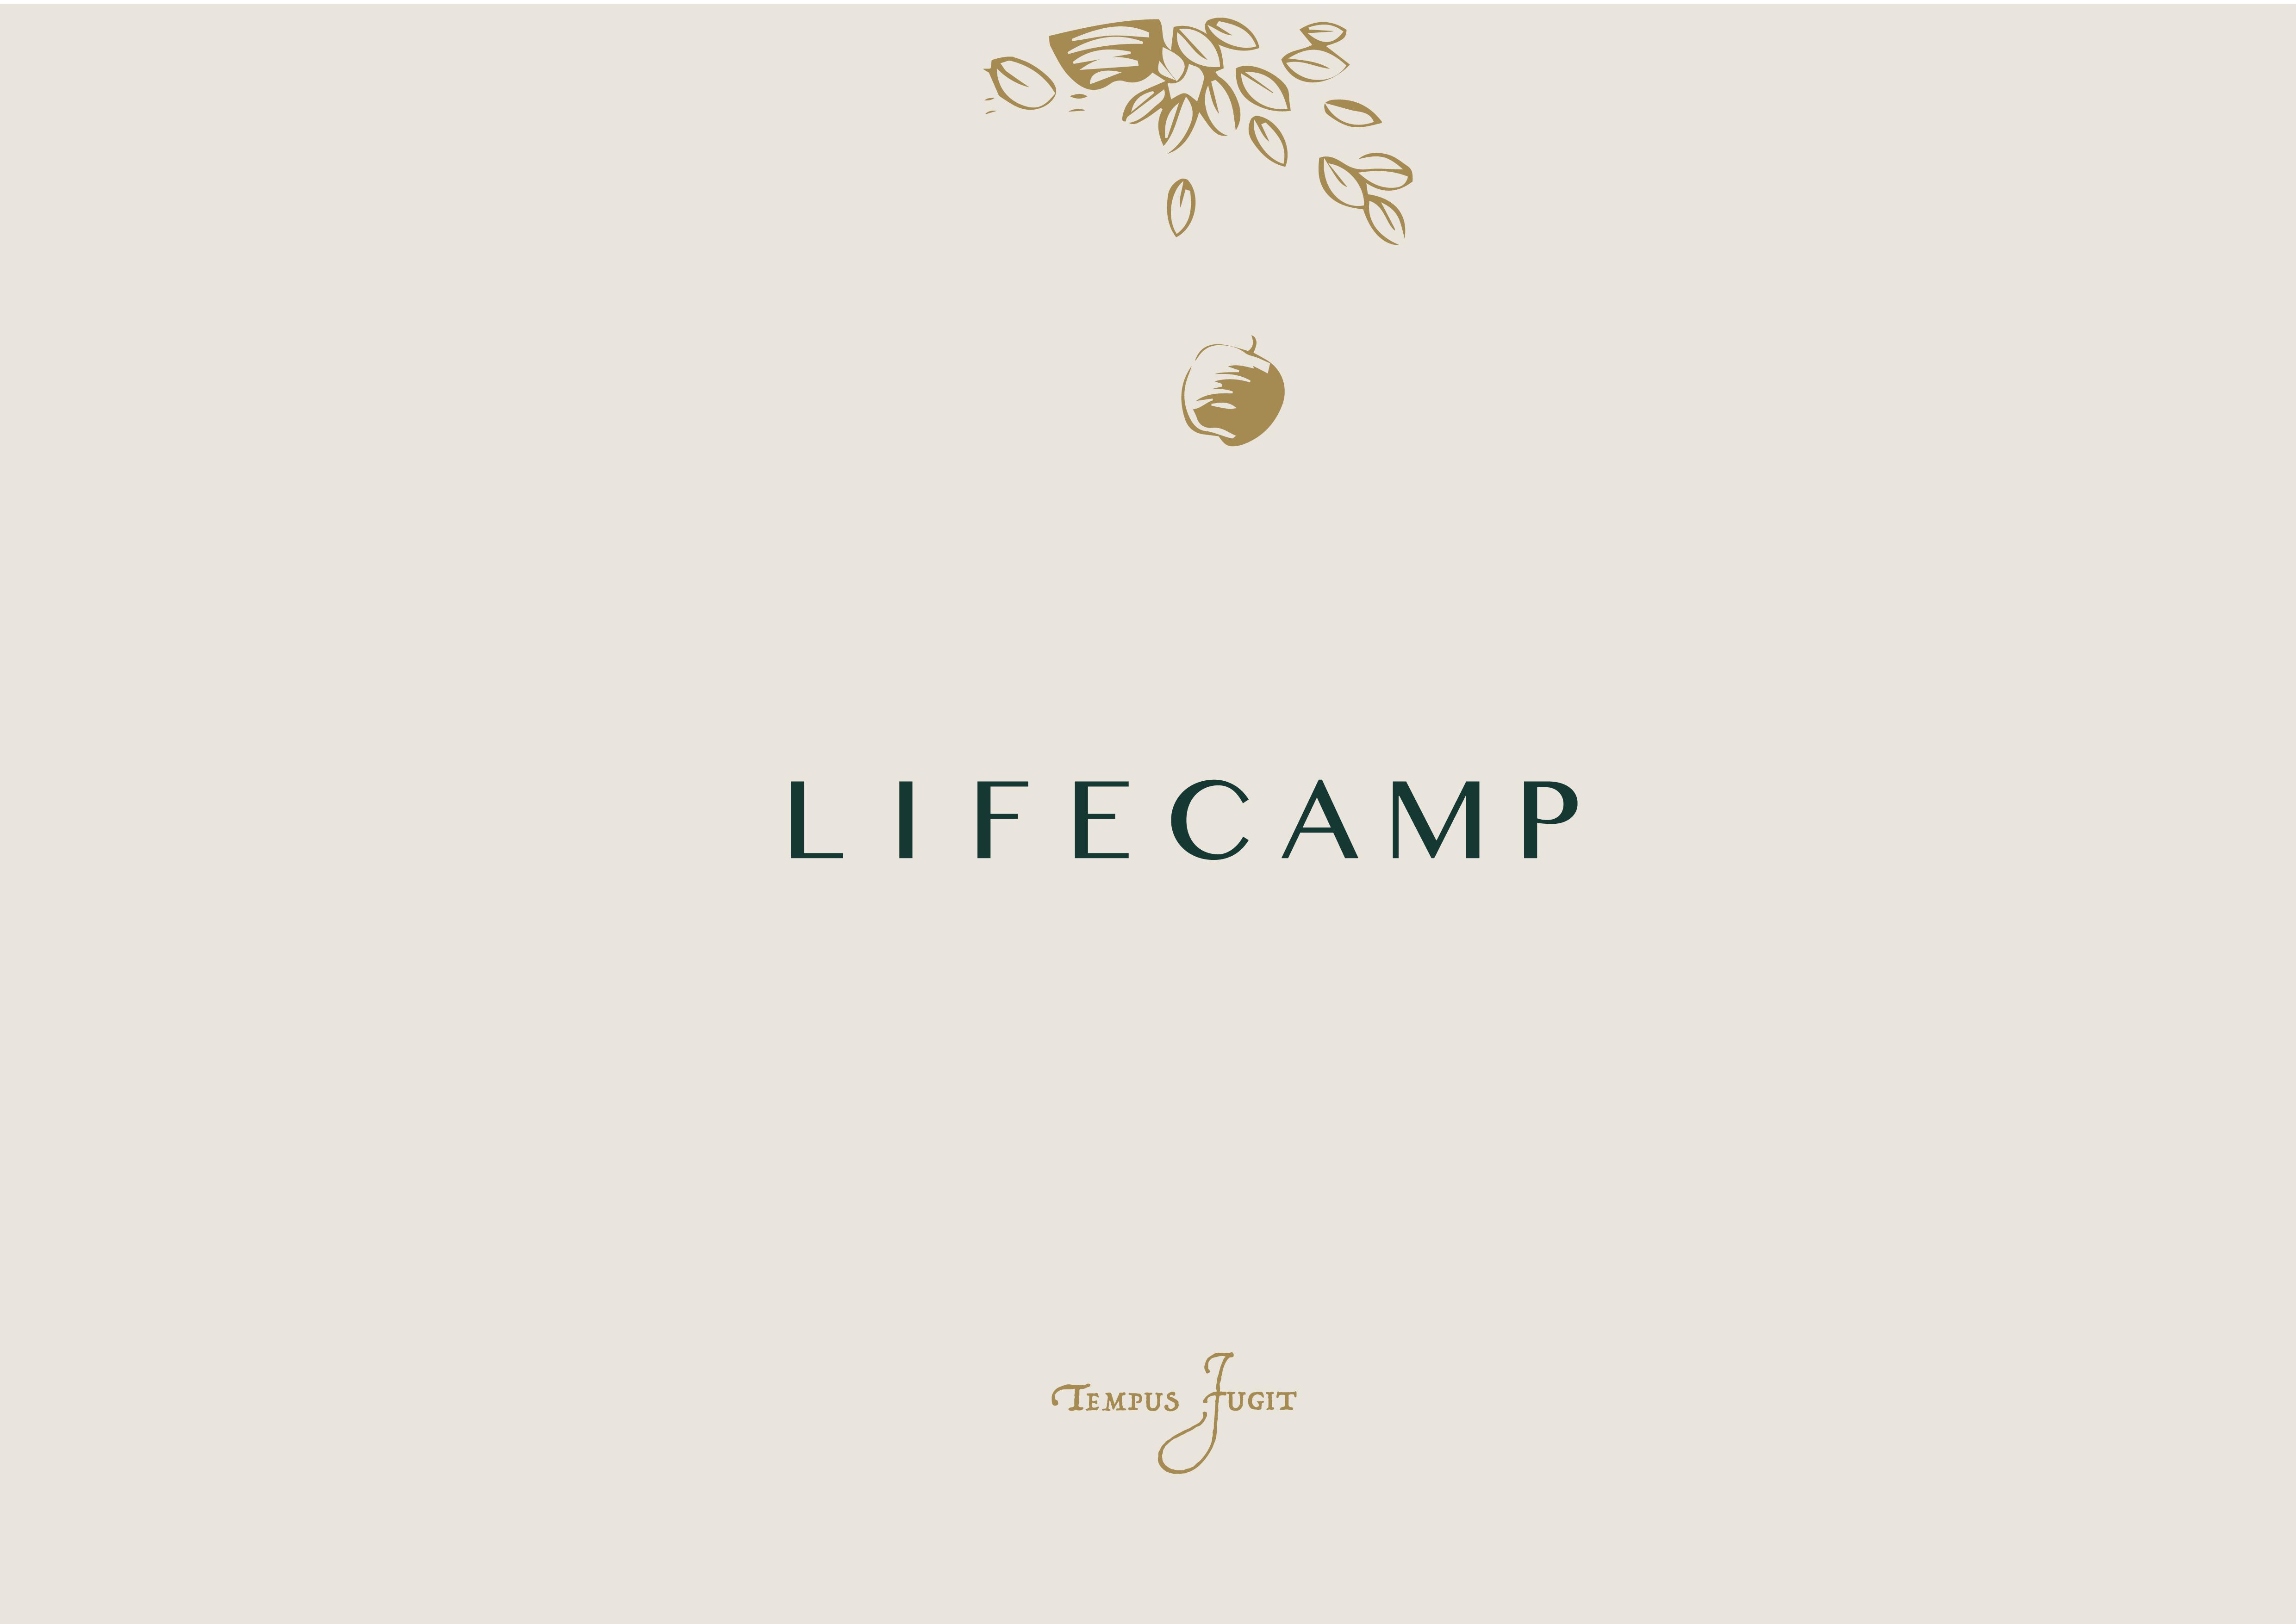 lifecamp 网页长图-02